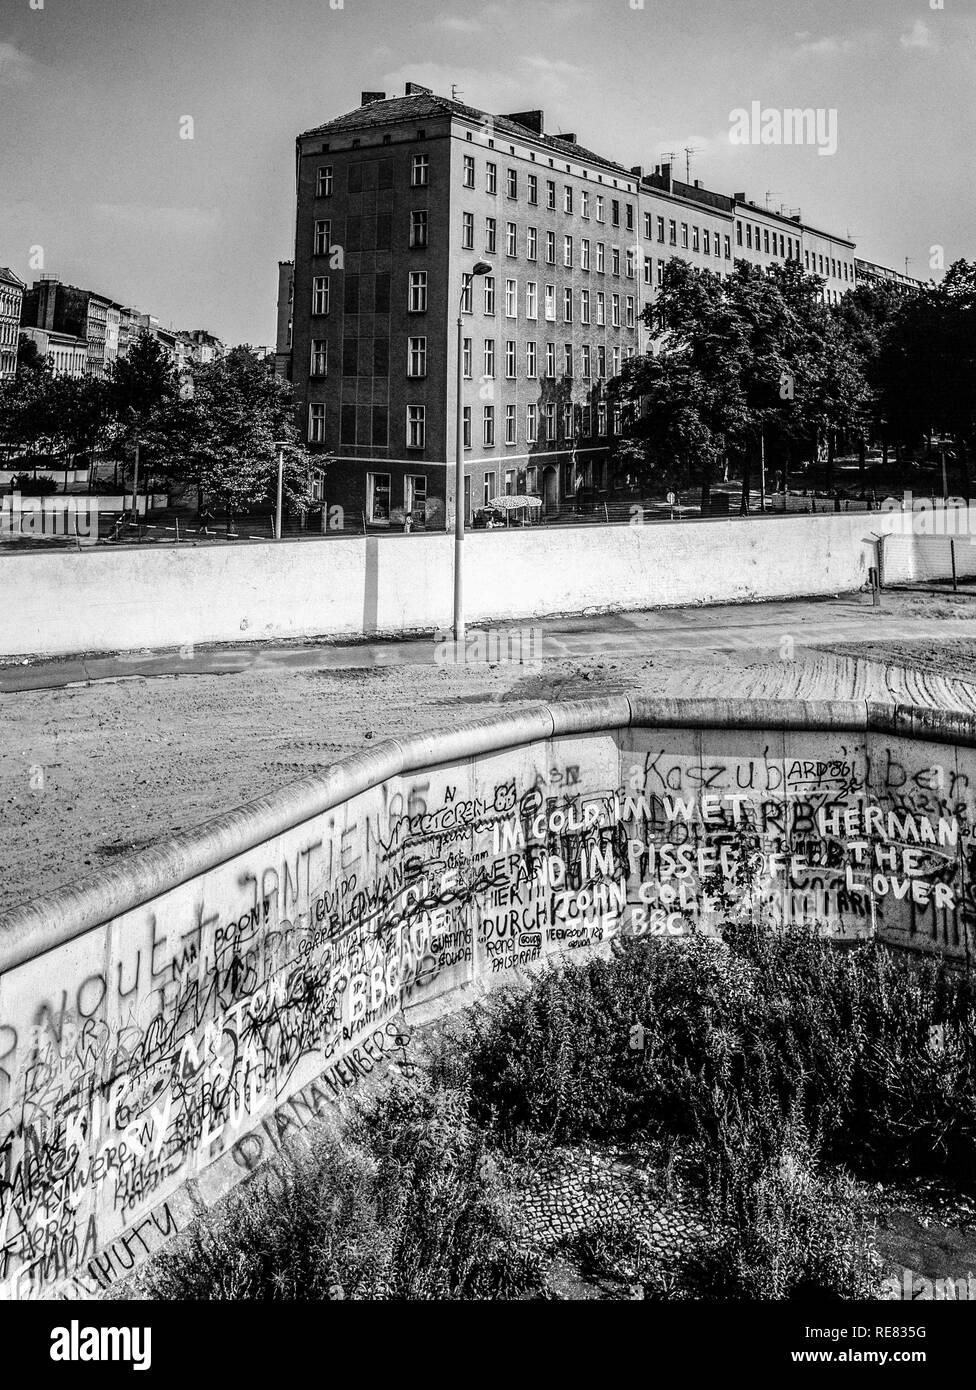 August 1986, Berlin Wall graffitis, death strip, end of Bernauer Strasse street, East Berlin buildings, Wedding, West Berlin side, Germany, Europe, - Stock Image